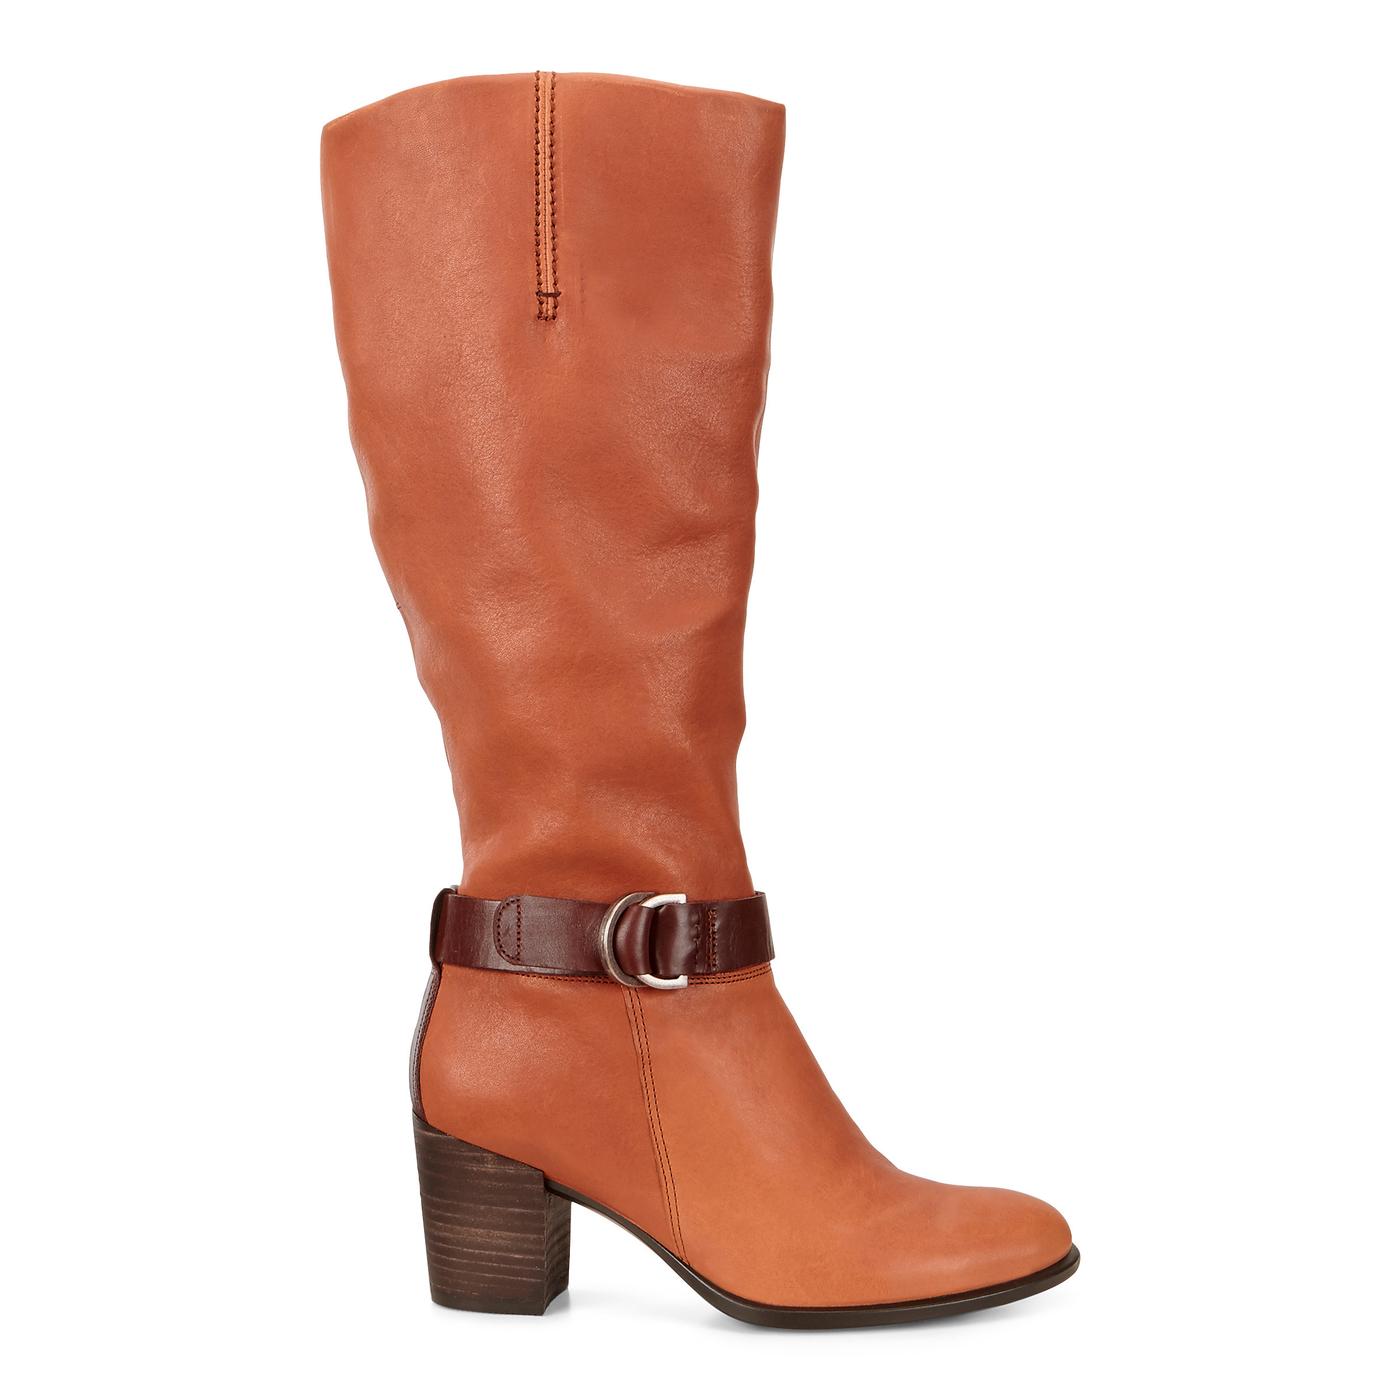 Ecco Women's Shape 55 Tall Boot $60 & More + Free Shipping